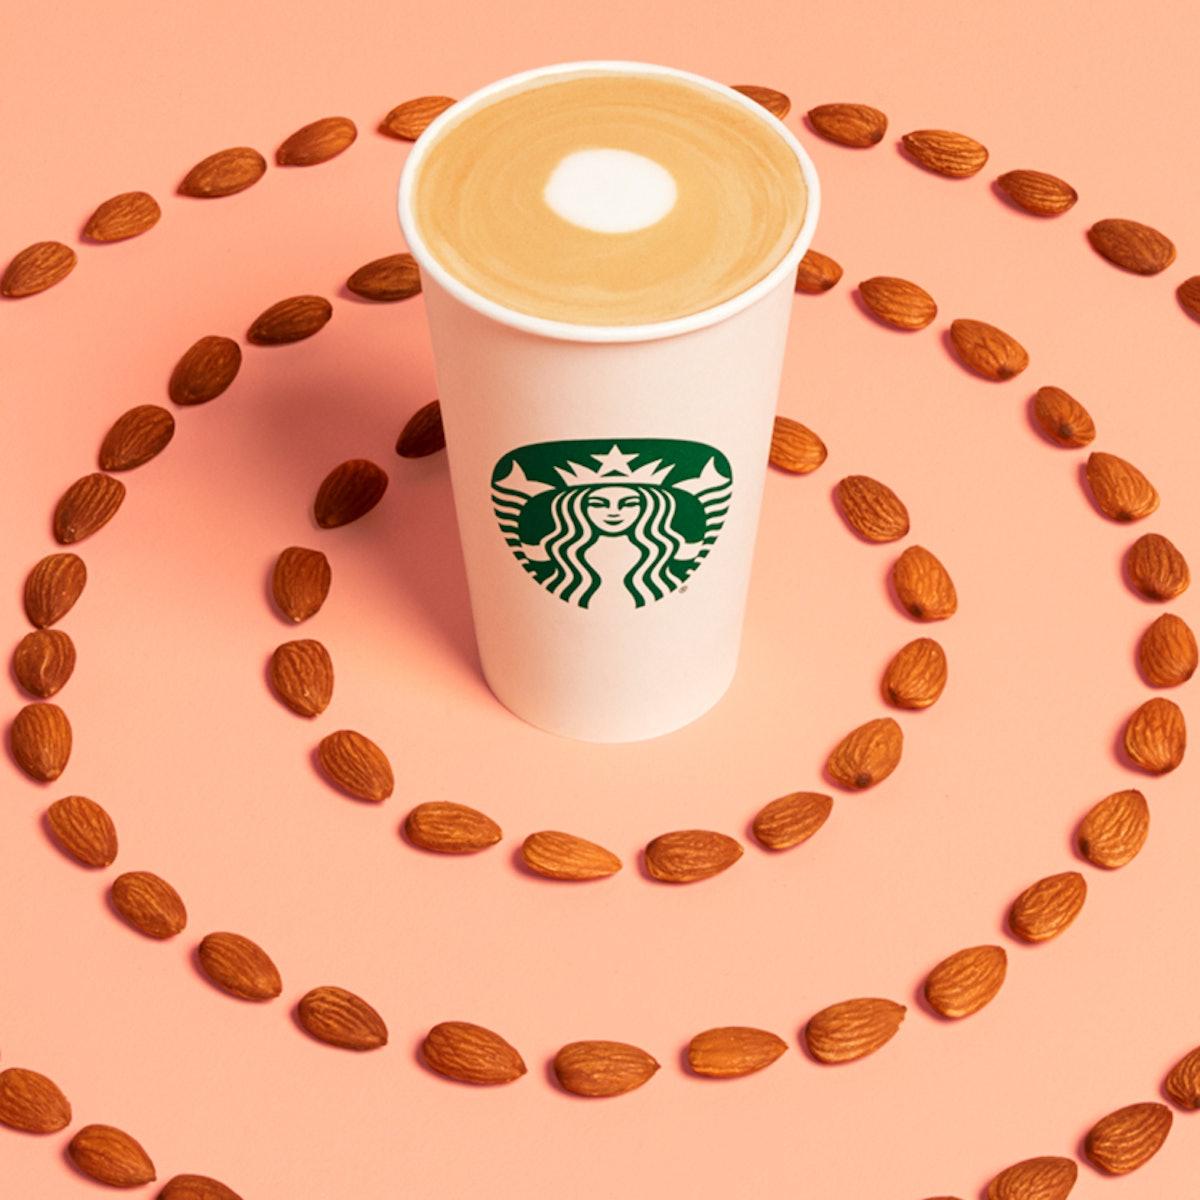 Starbucks' new non-dairy options include the Coconutmilk Latte and Almondmilk Honey Flat White